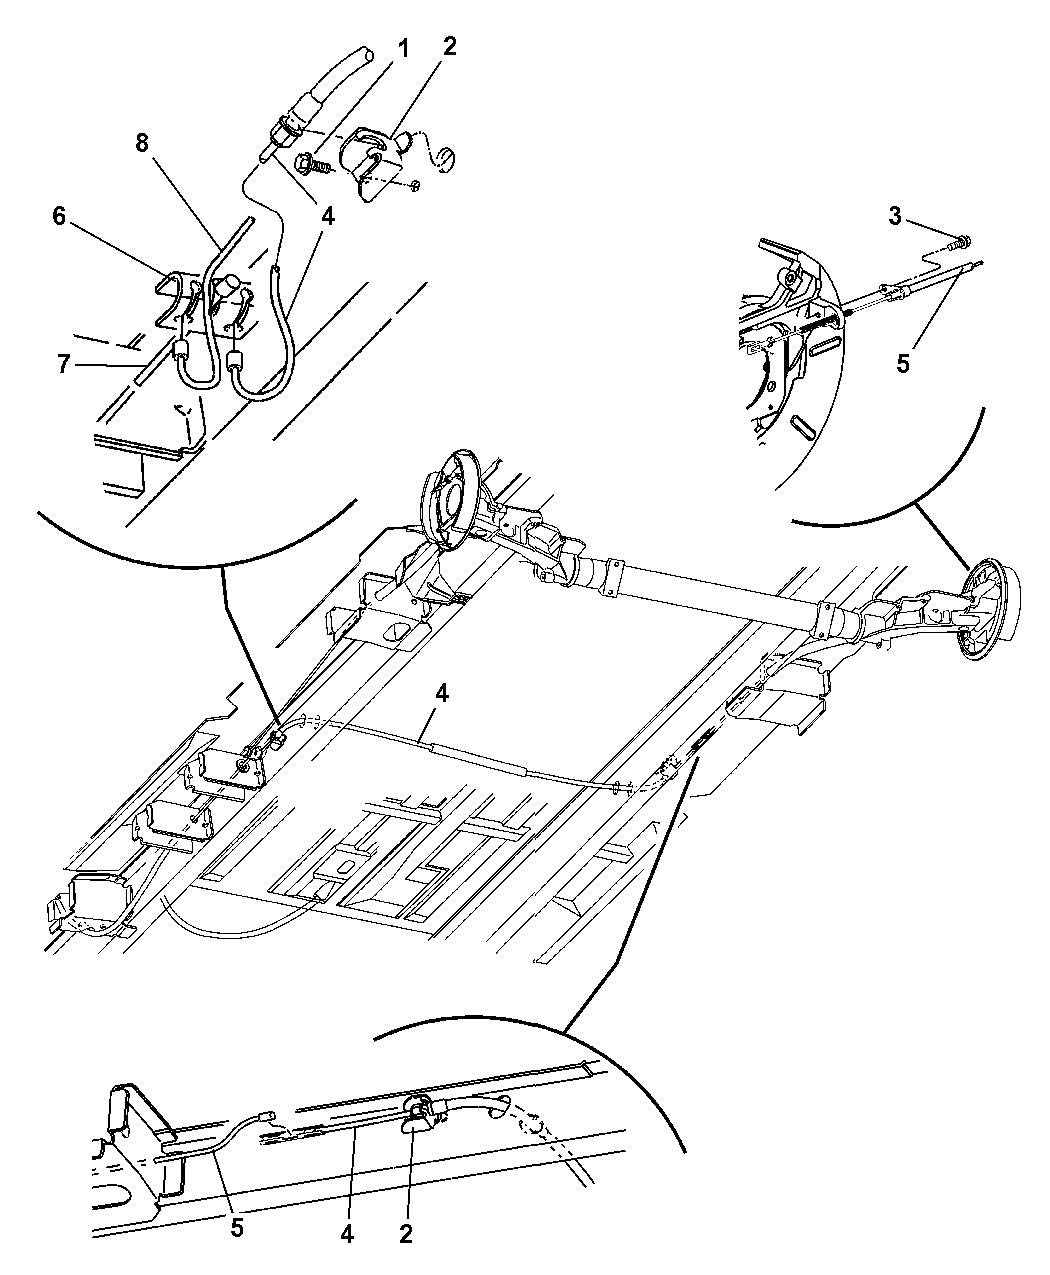 2005 dodge grand caravan cables, rear, parking brake - thumbnail 1